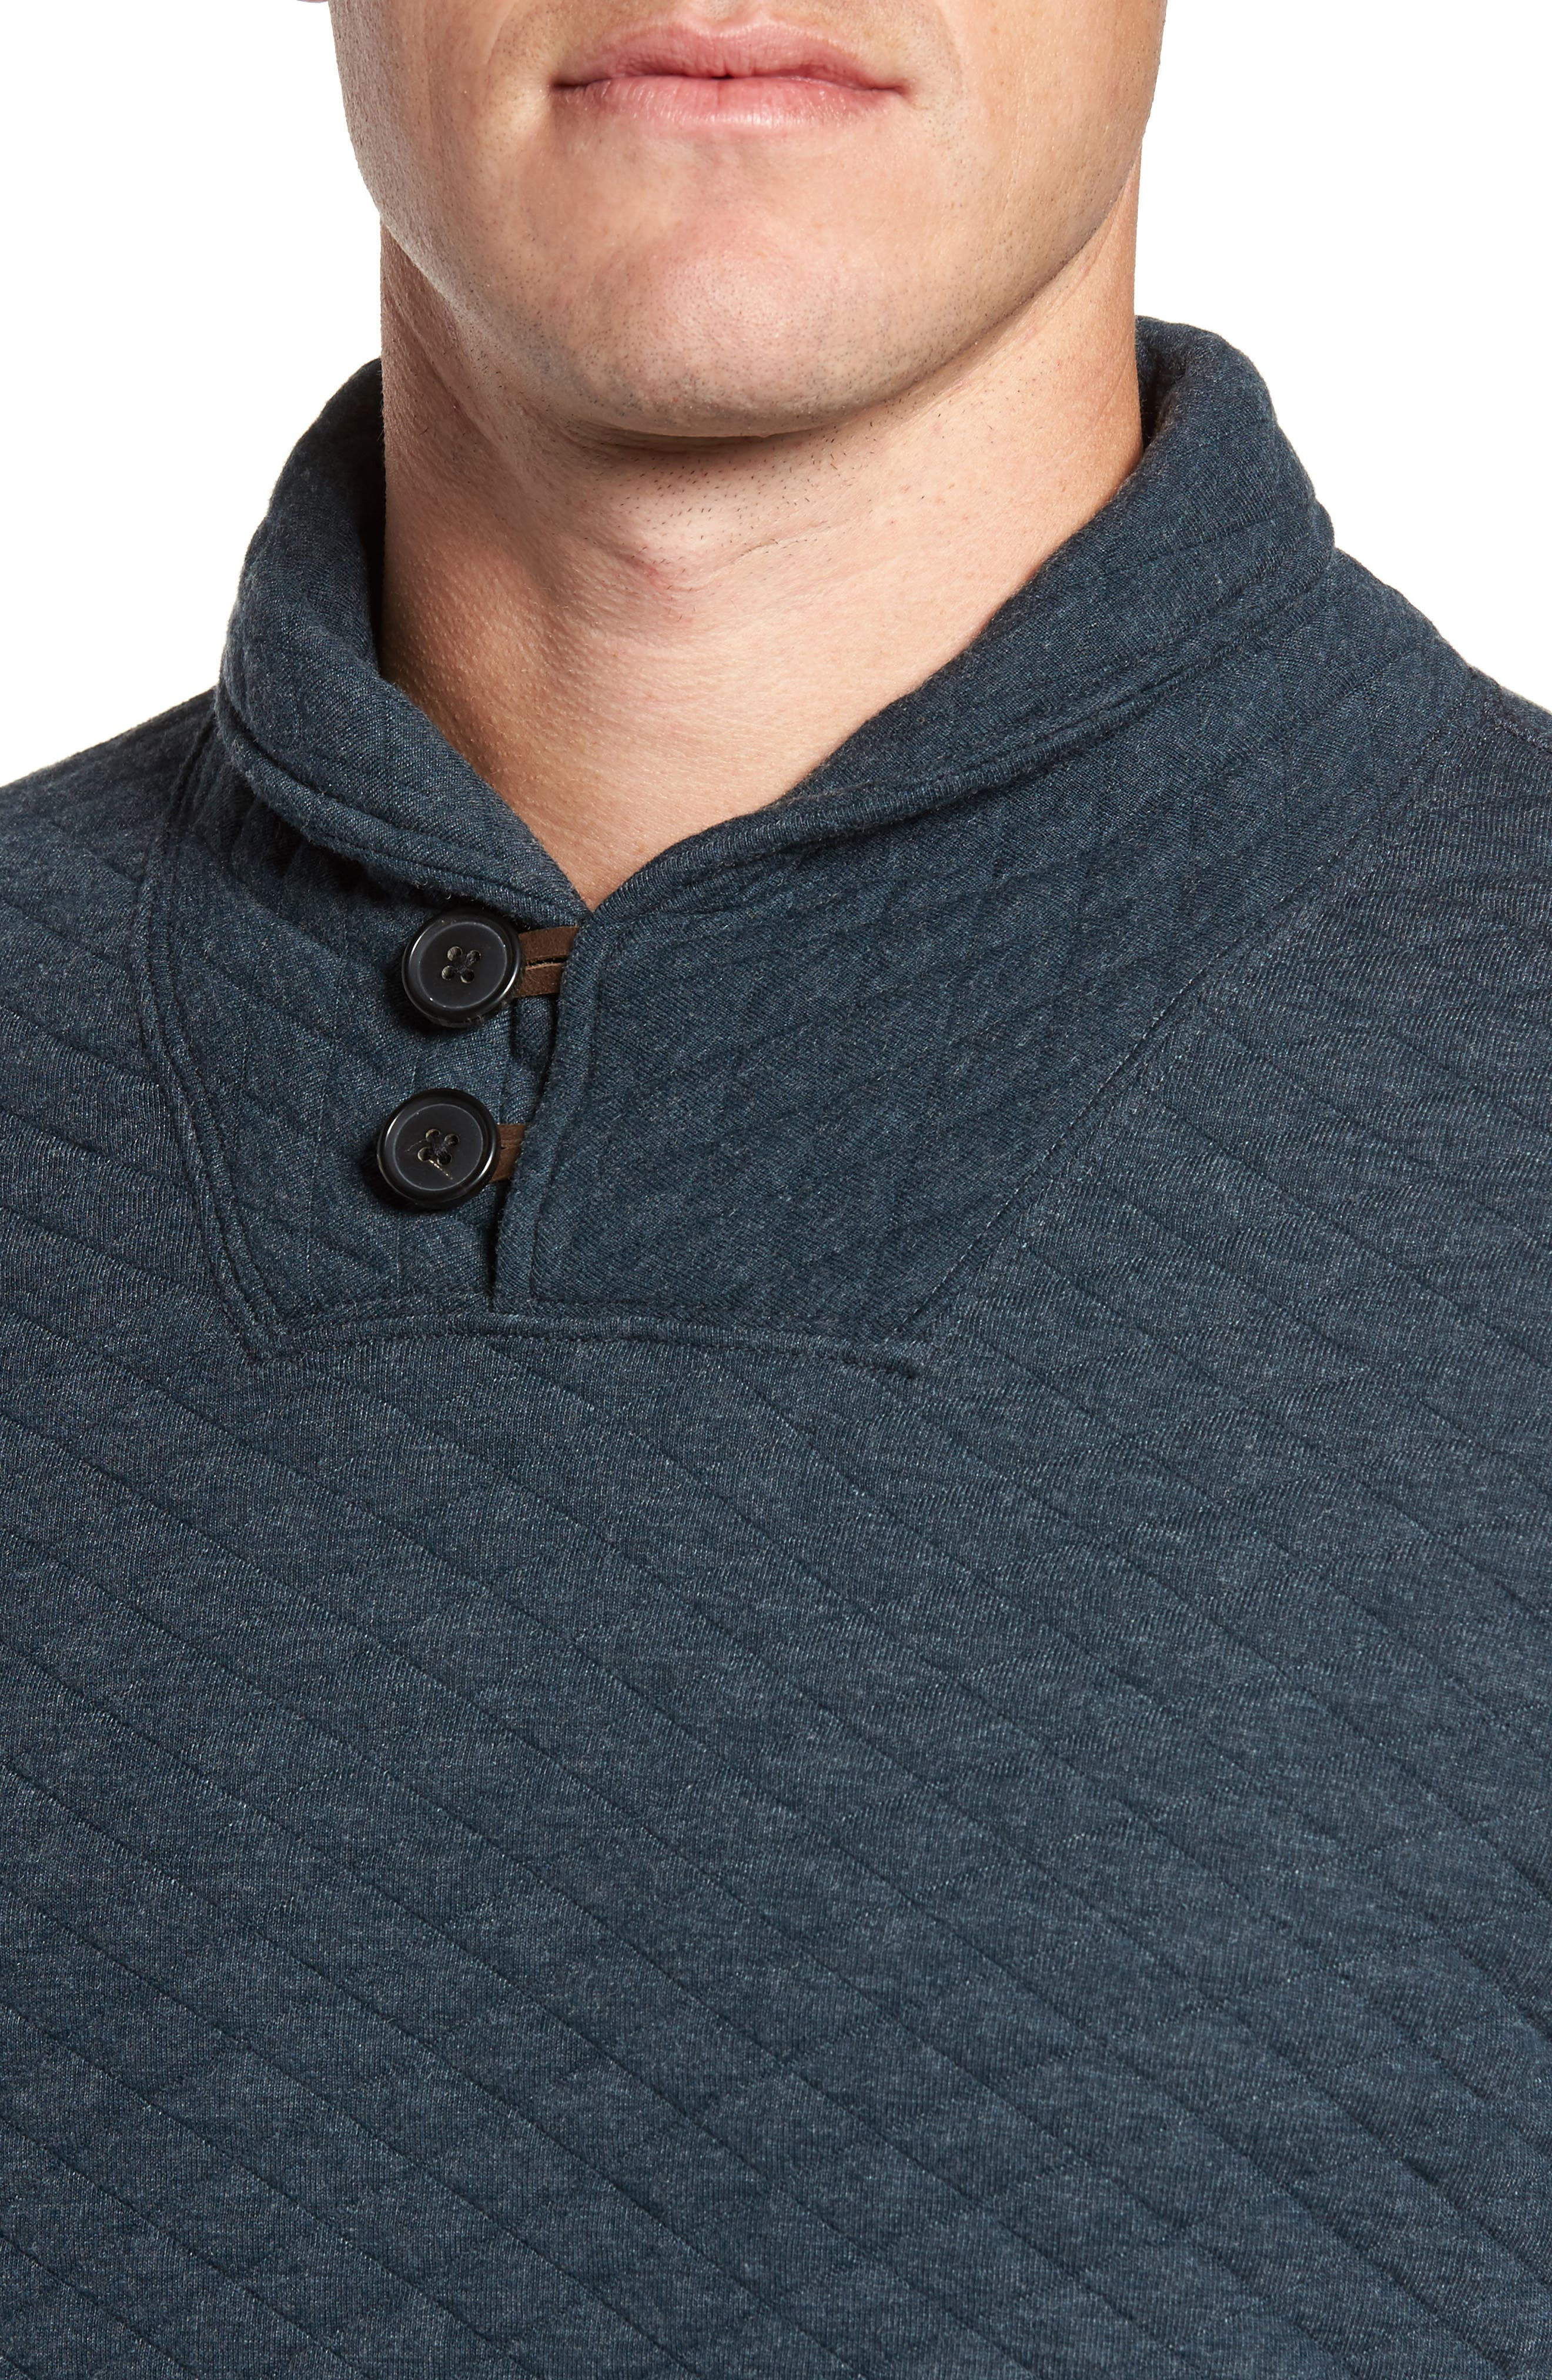 BILLY REID,                             Shawl Collar Pullover,                             Alternate thumbnail 4, color,                             402